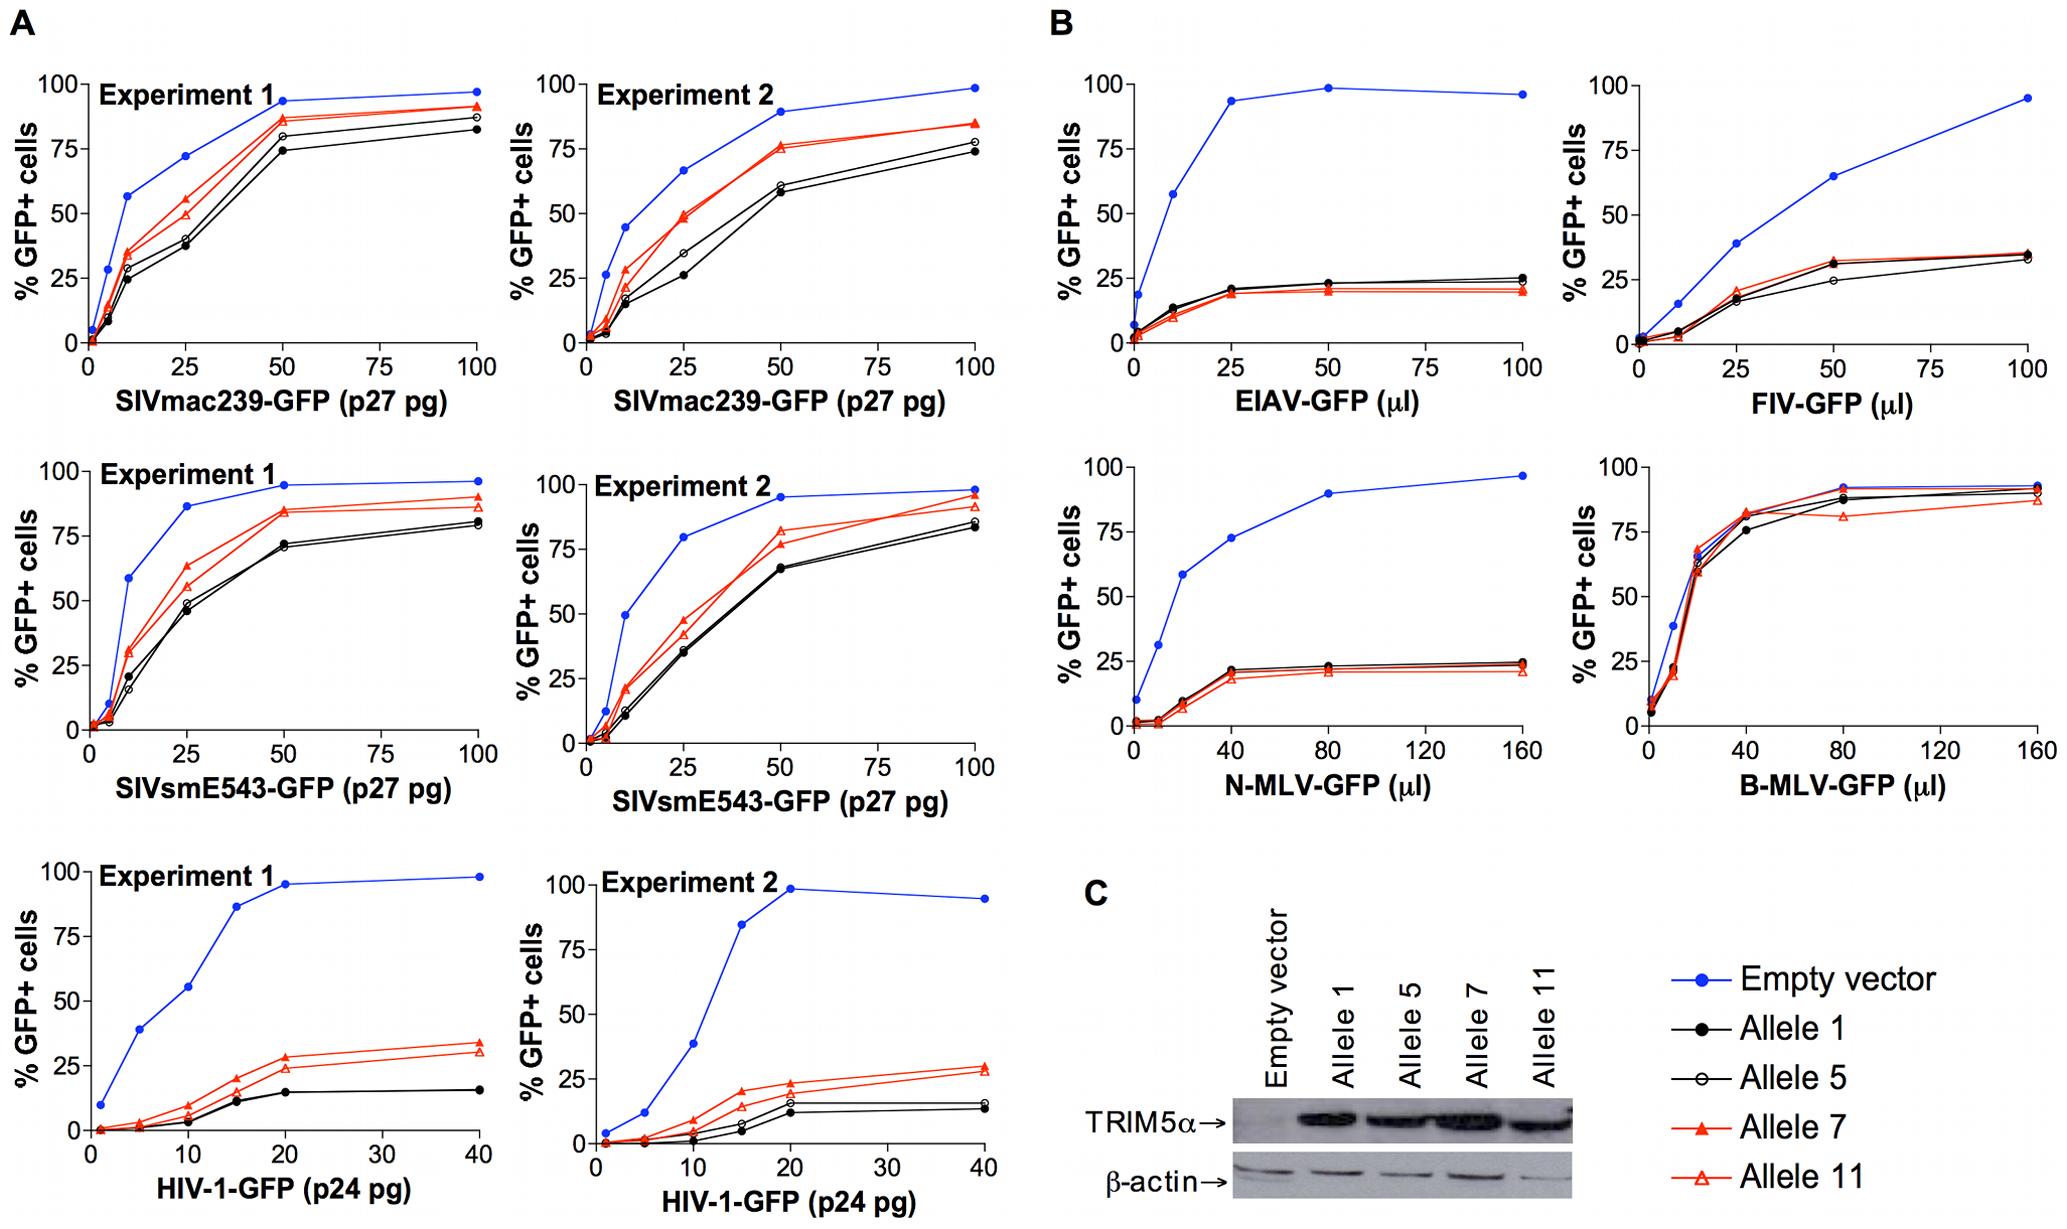 Antiretroviral activity of TRIM5α variants expressed in feline renal fibroblast (CRFK) cells.